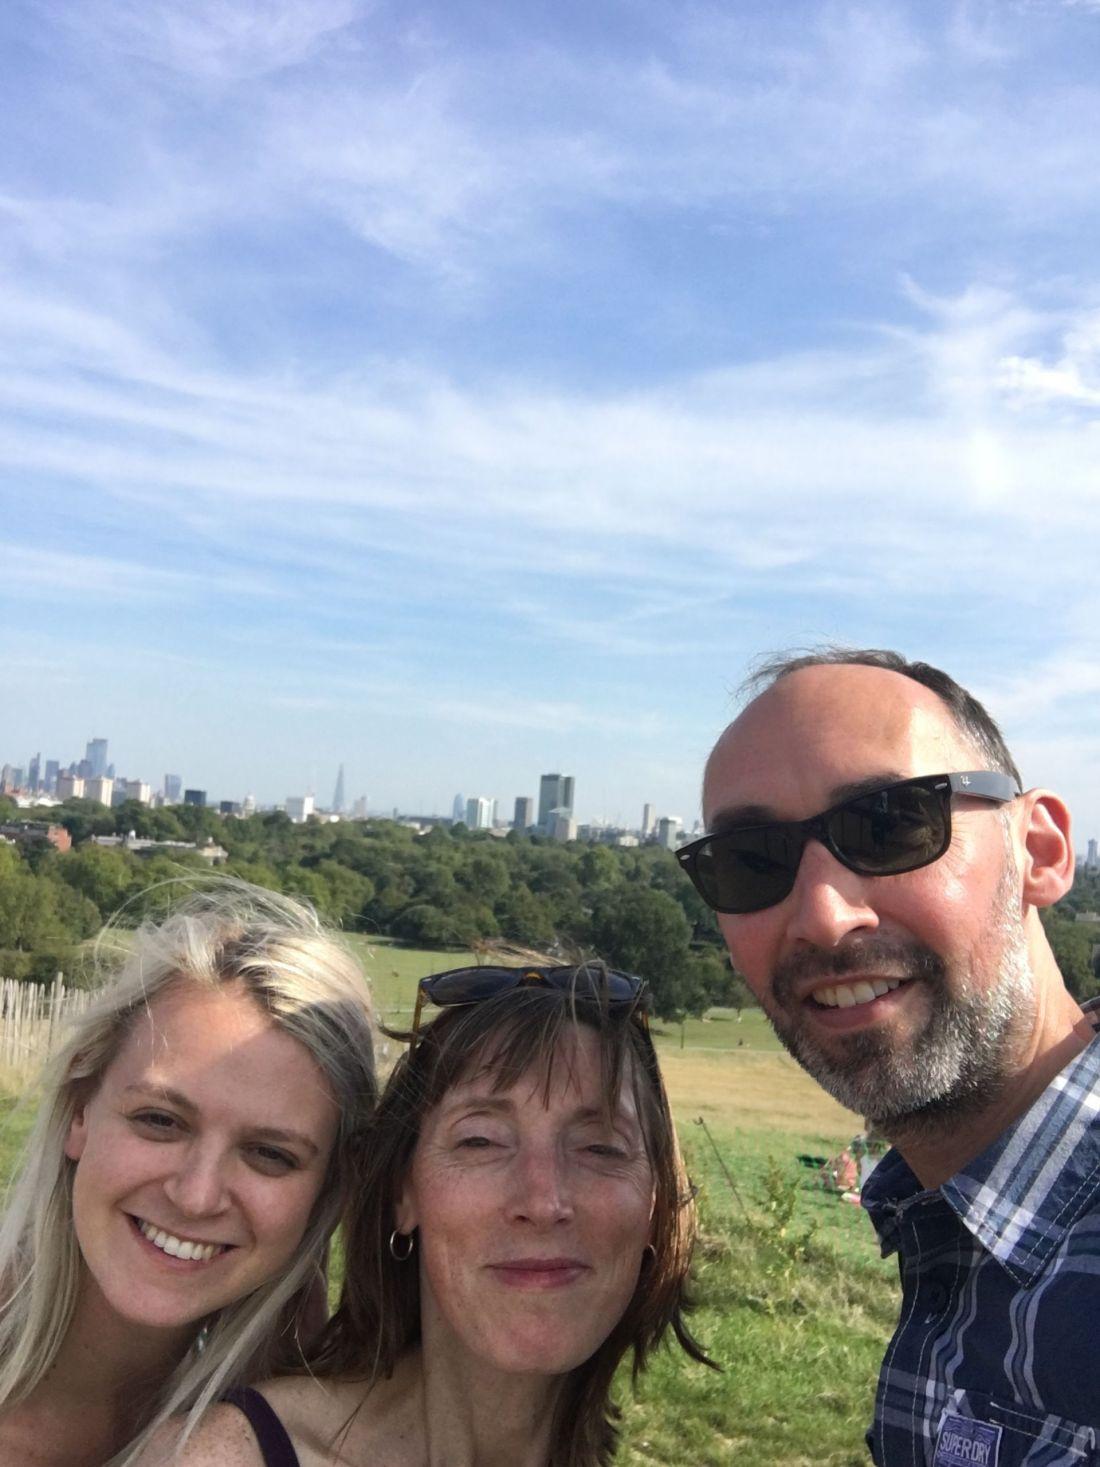 Family enjoying the city views over London